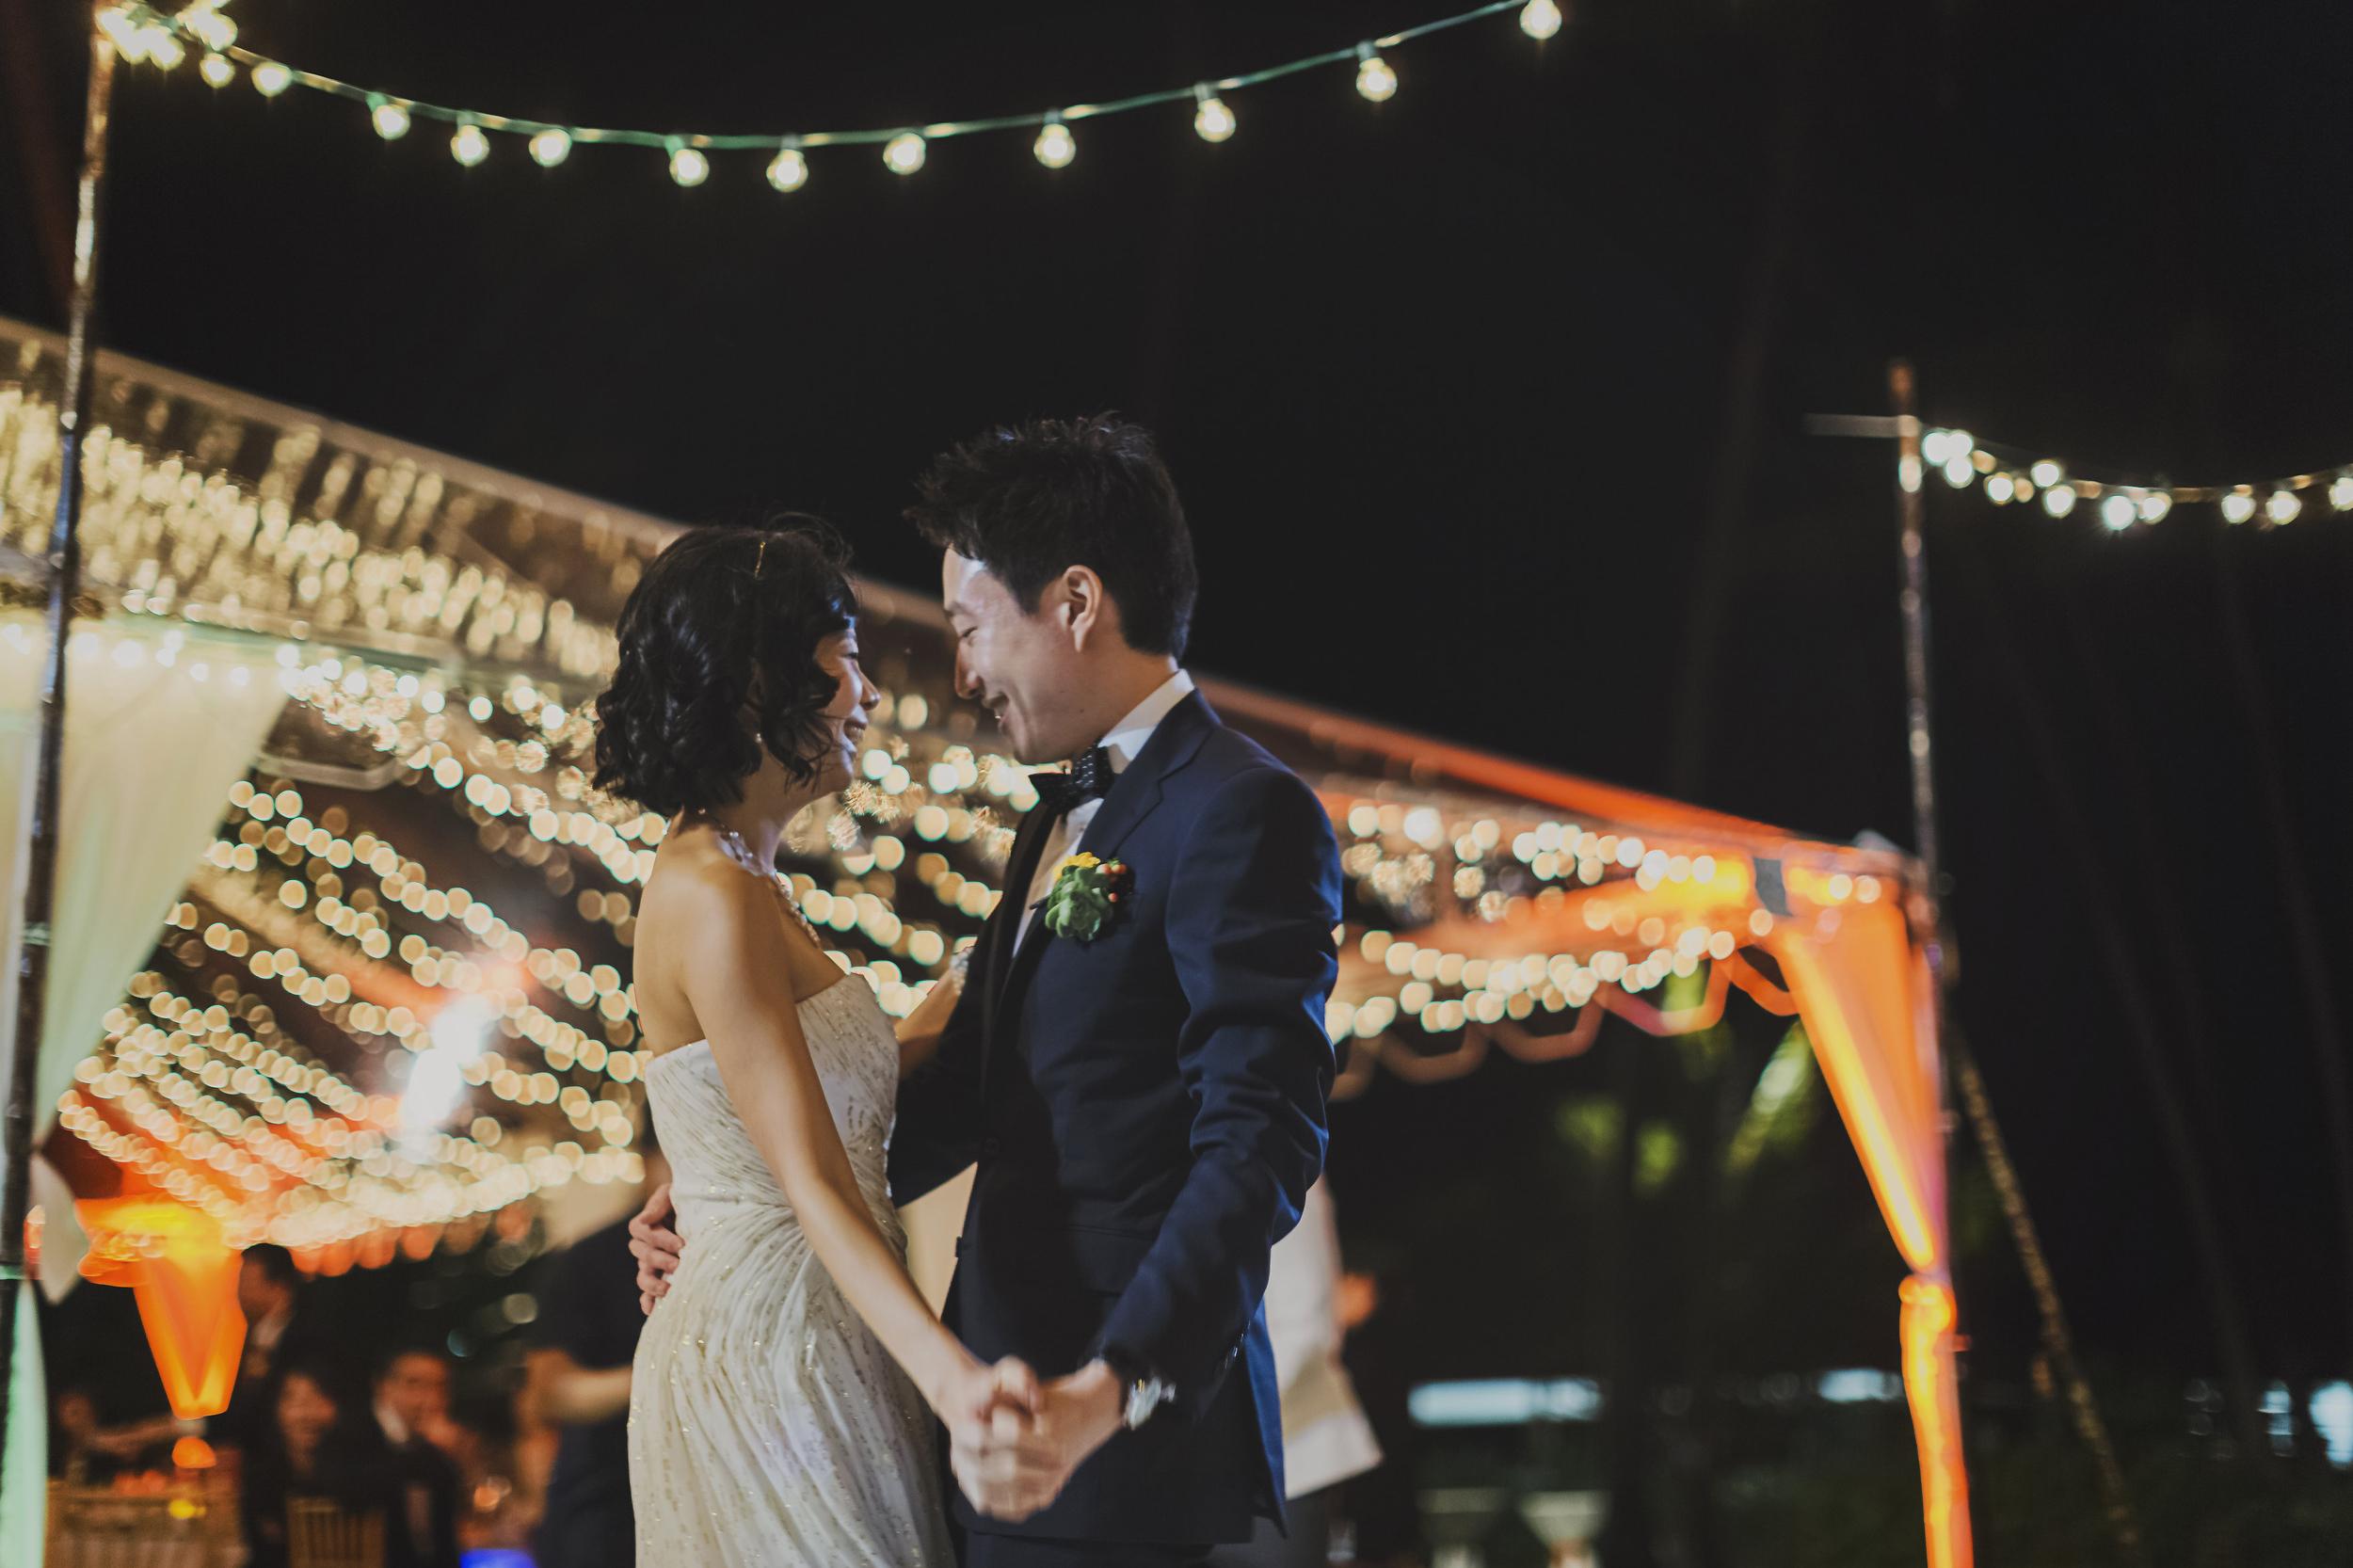 angie-diaz-photography-oahu-wedding-lanikuhonoa-shenshen-marshall-68.jpg